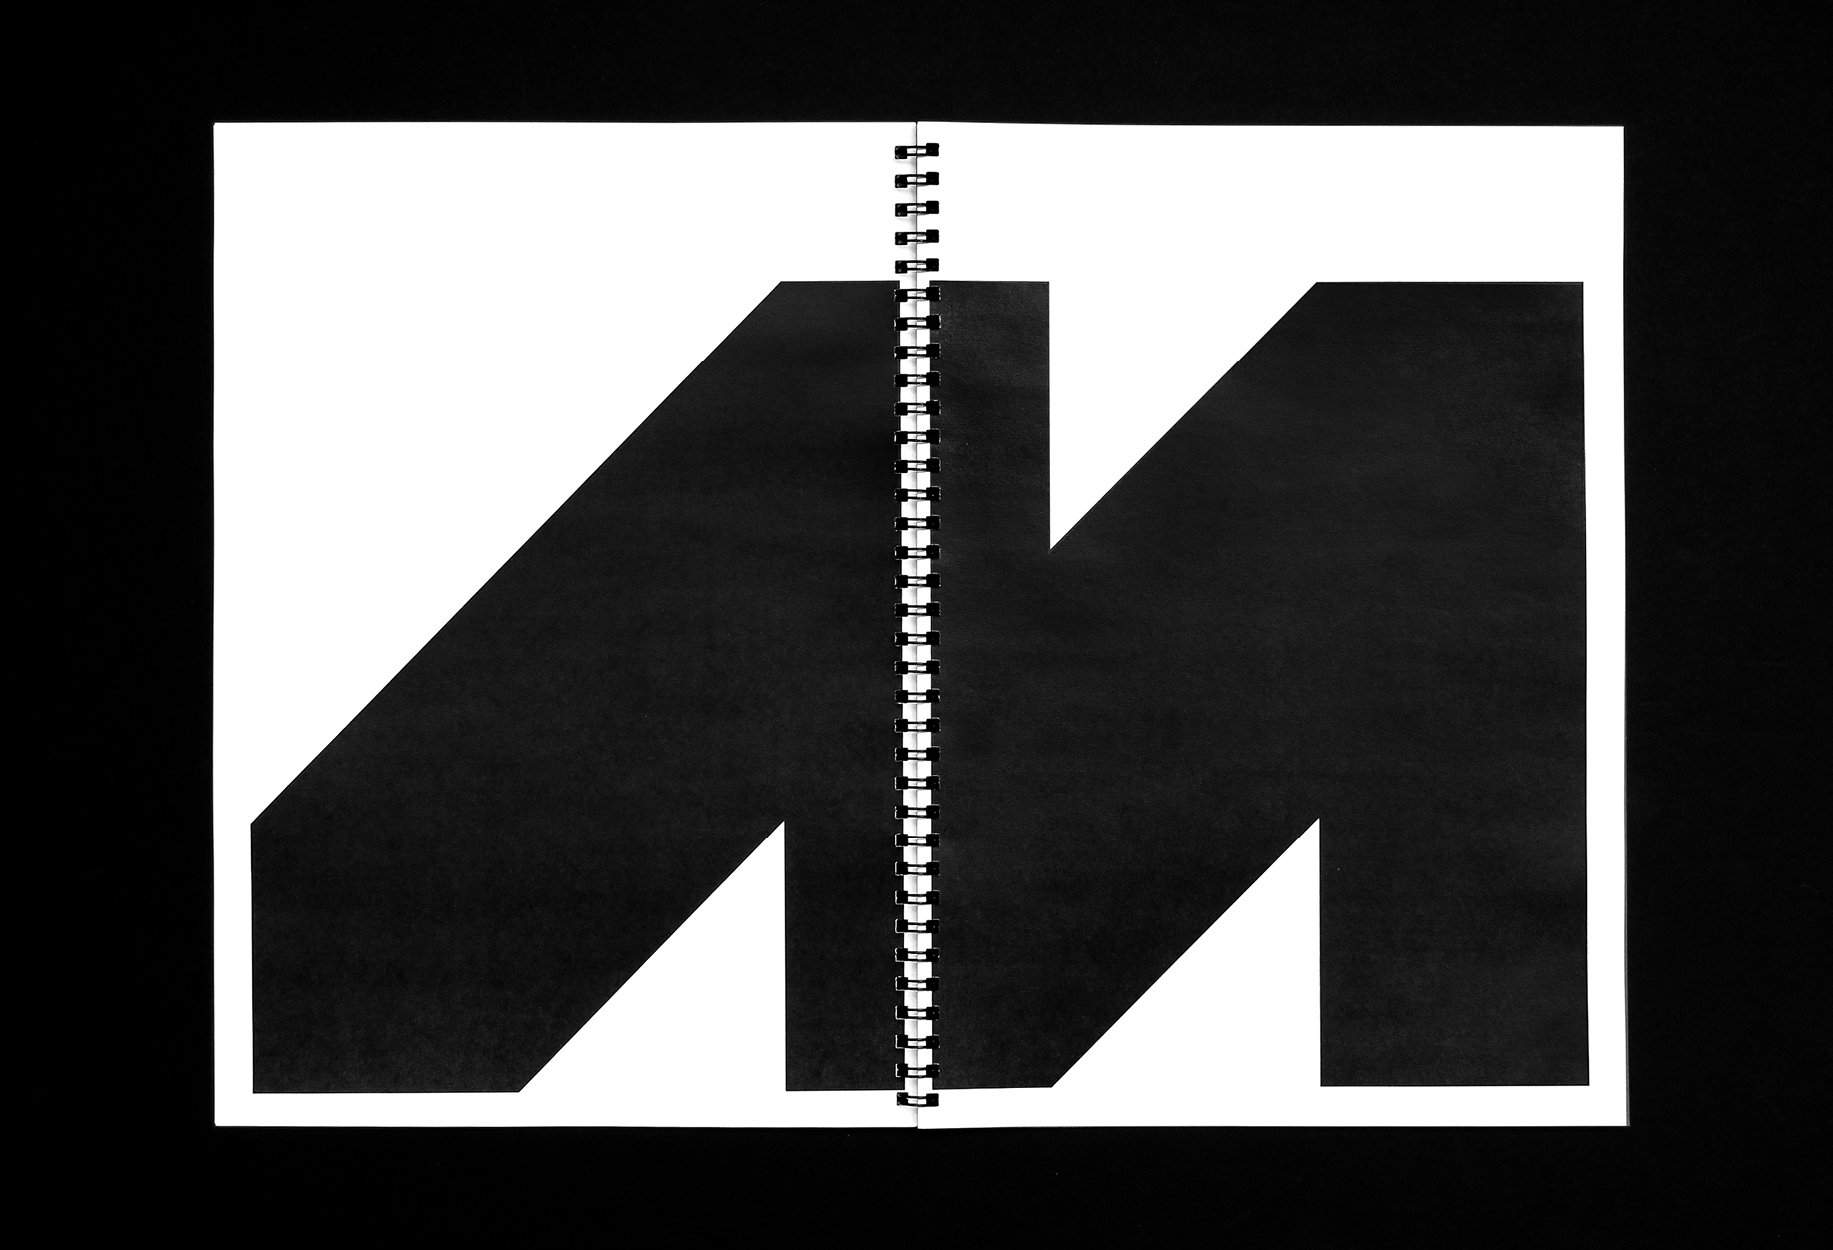 Metempsy-Graphic-Design-Standards-Manual-17.jpg